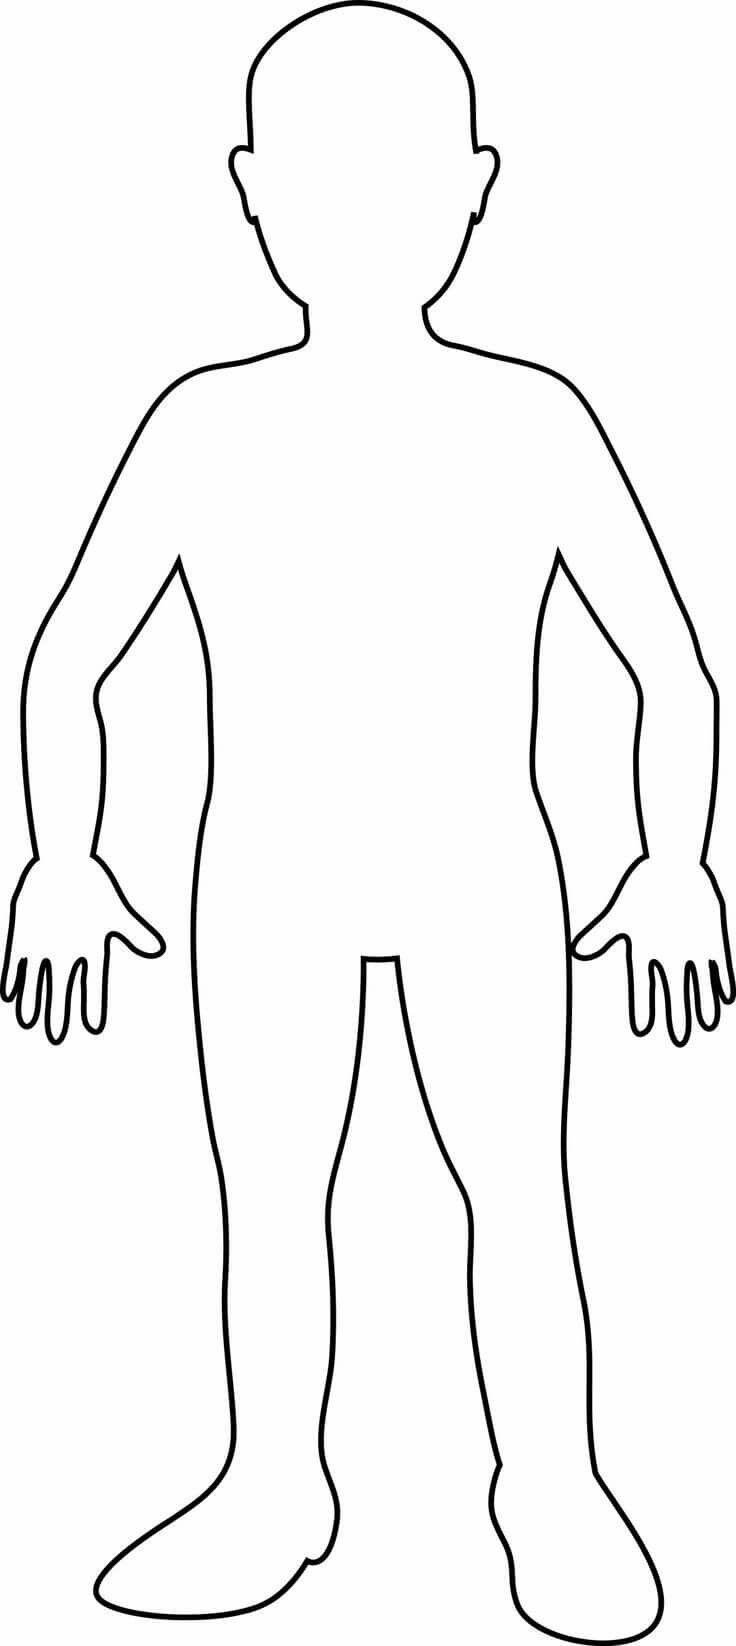 Pin de Dragu Andreea en Corpul | Pinterest | Cuerpo humano ...